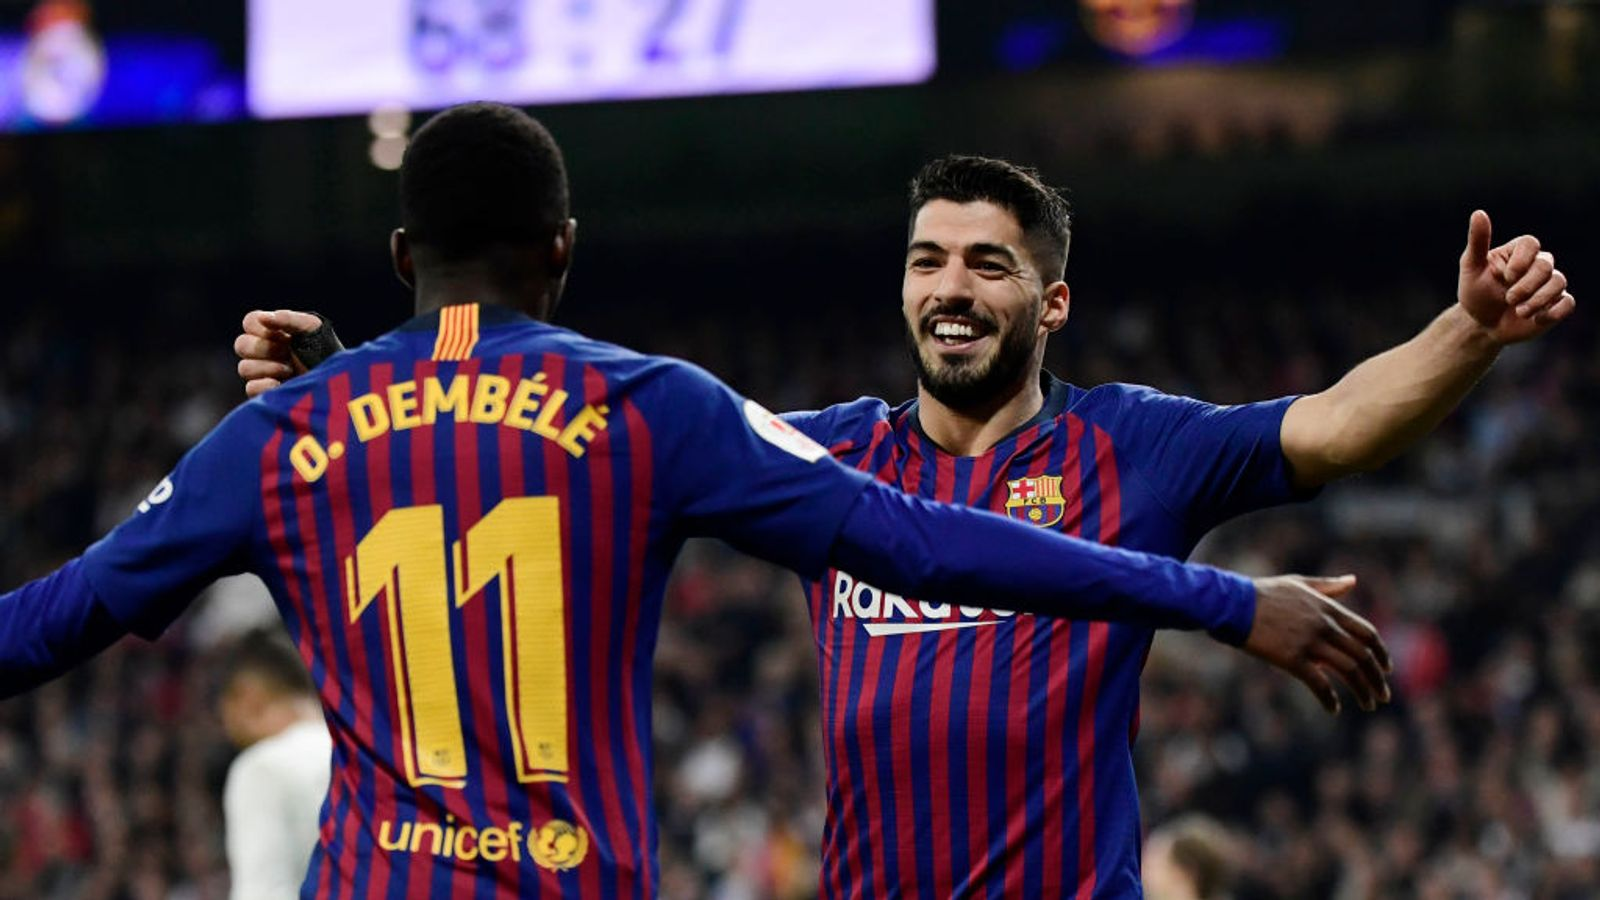 86b63de62 R Madrid 0 - 3 Barcelona - Match Report   Highlights